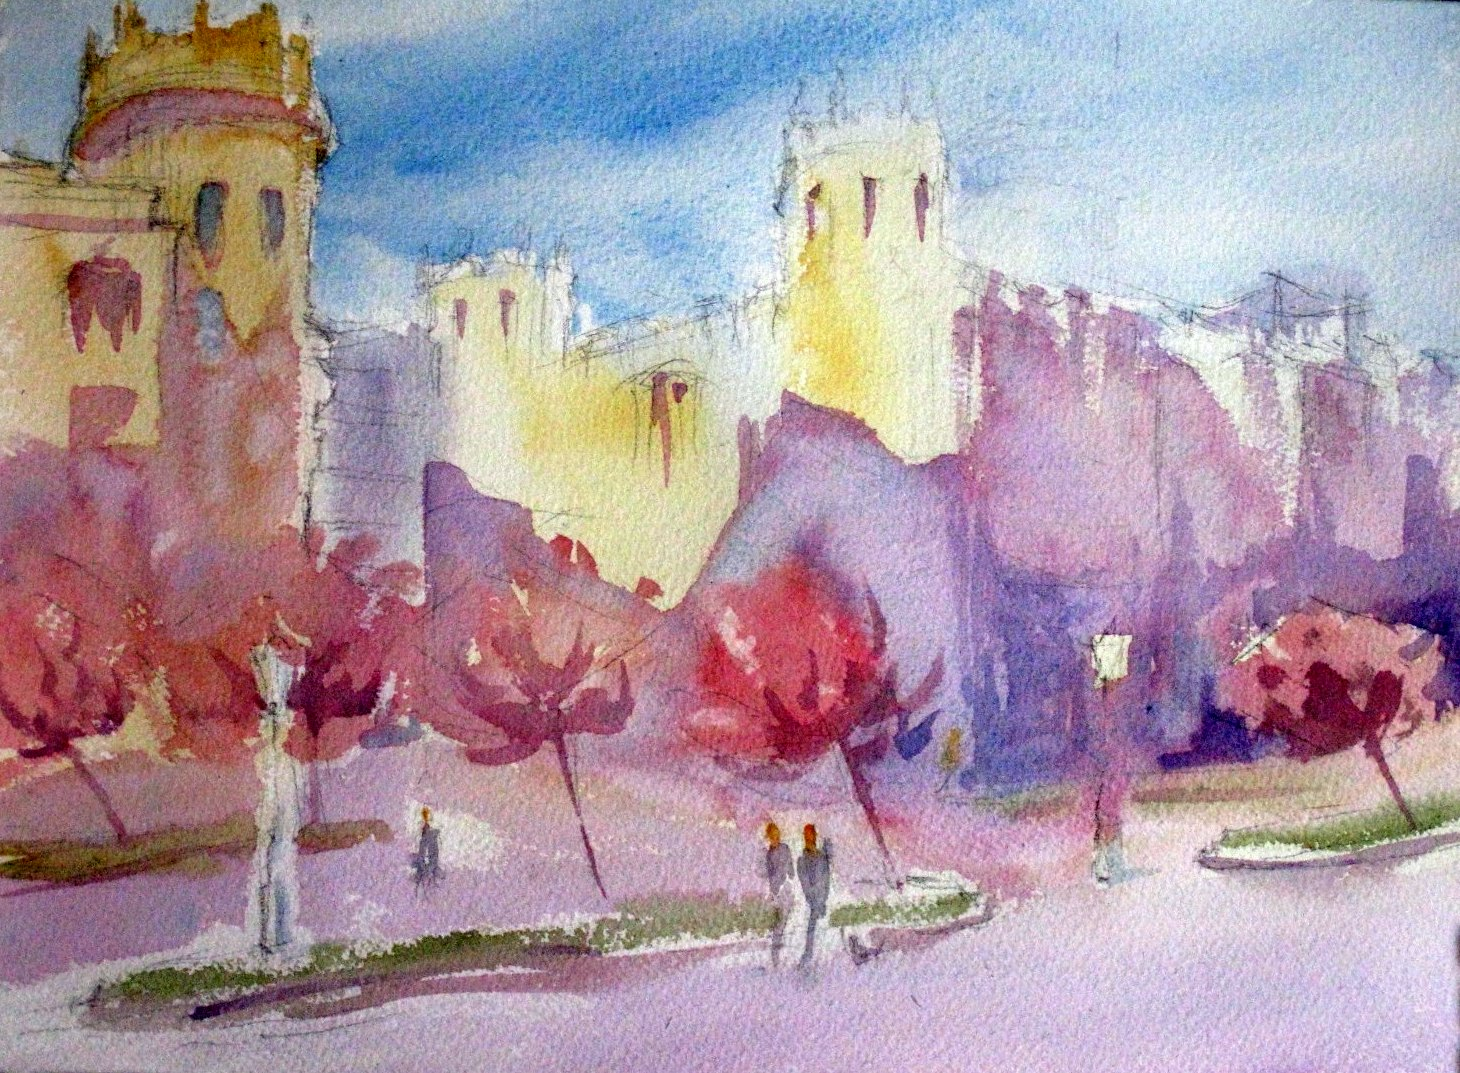 Pintar a la acuarela jardin salazar zub a bilbao for Jardines 6 bilbao